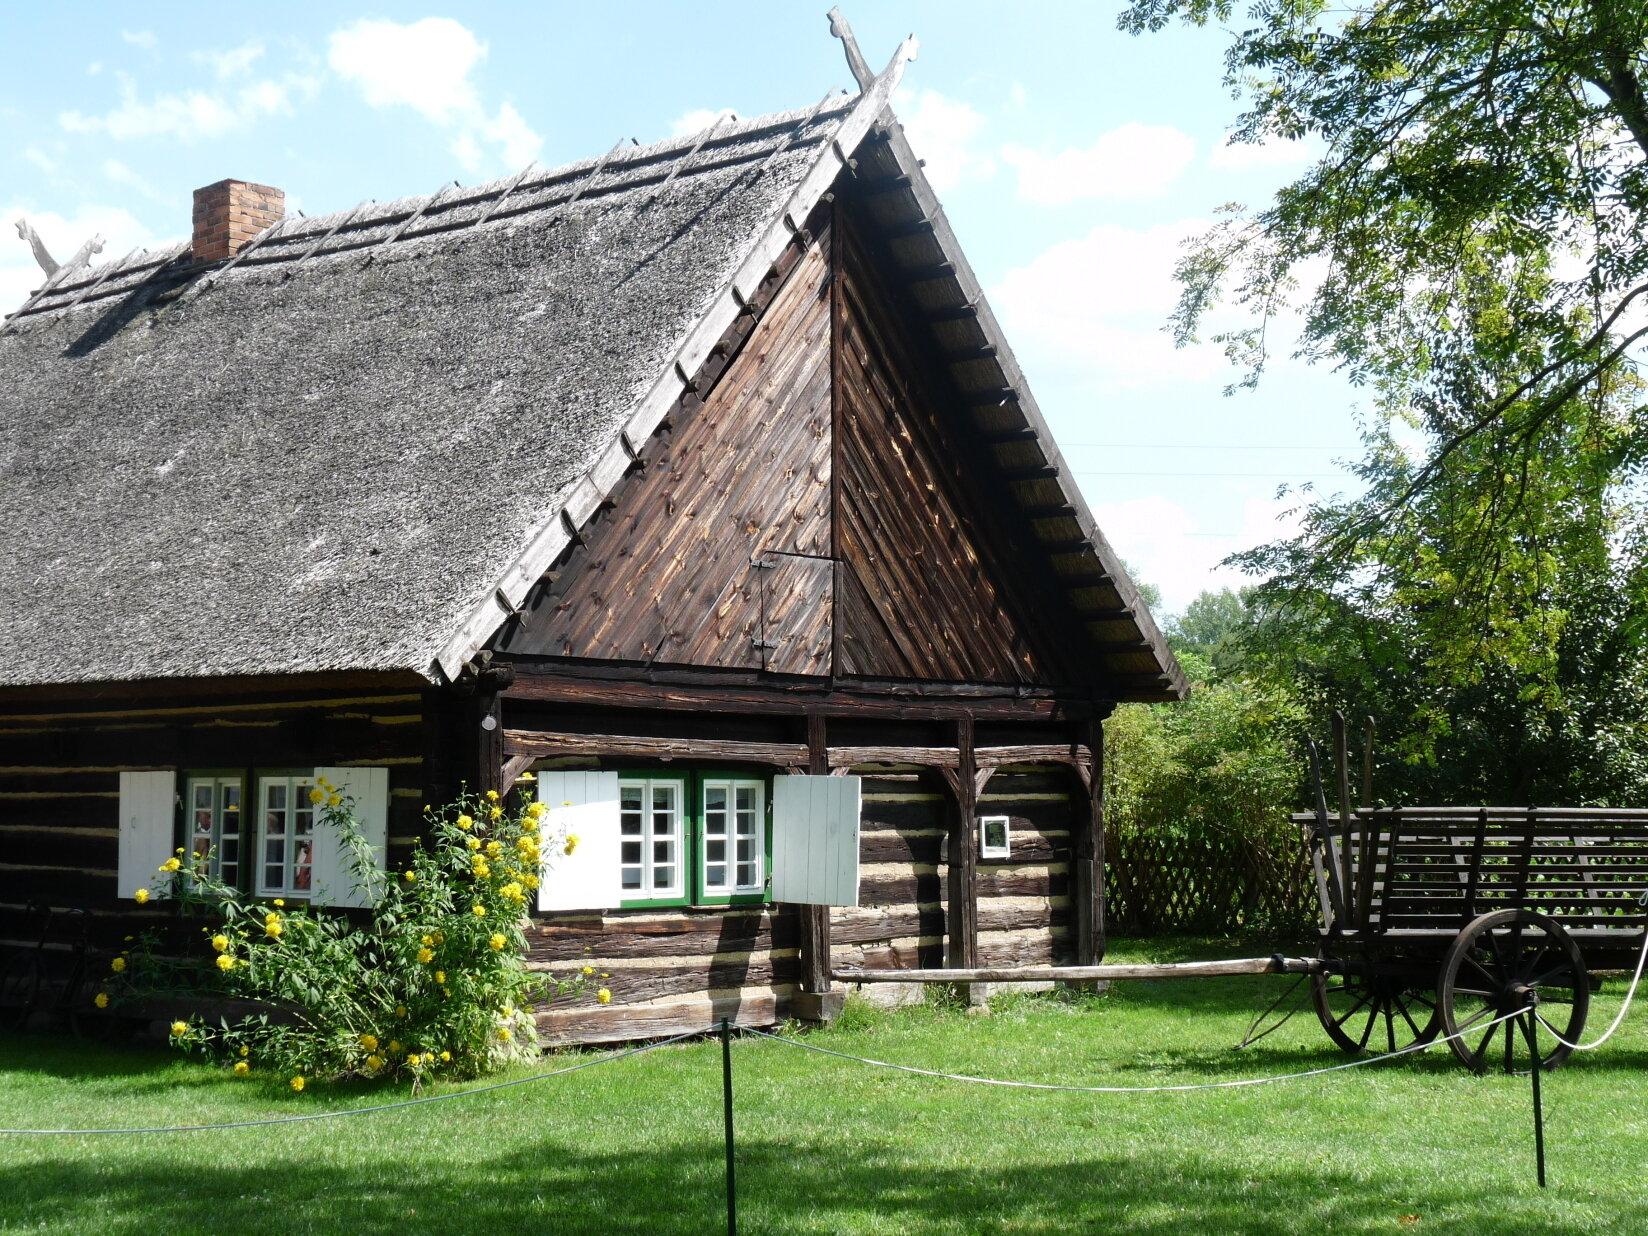 Freilandmuseum Lehde, Quelle: Landkreis OSL